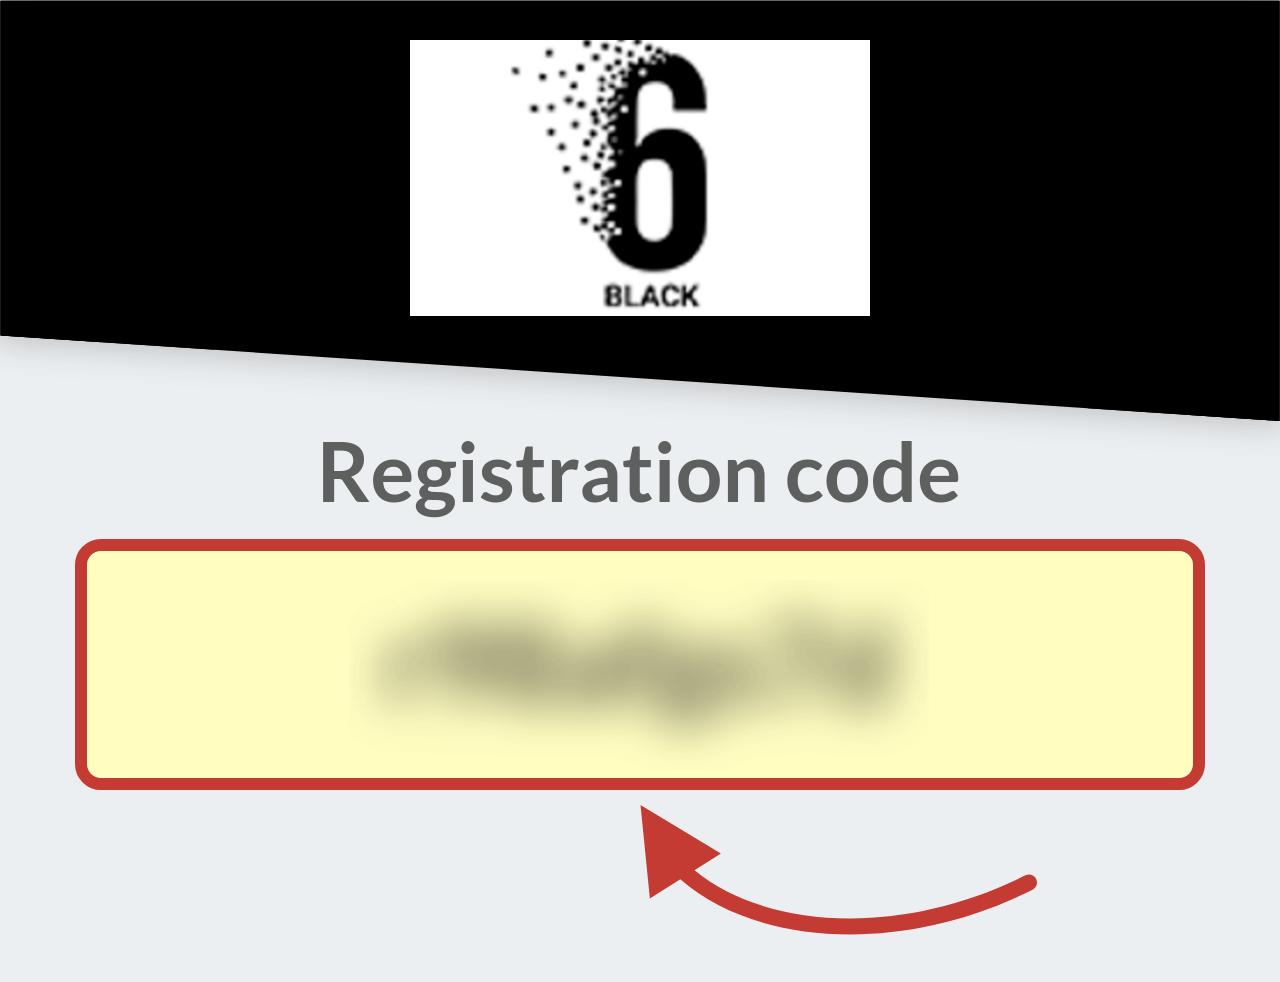 6black Casino Registration Code